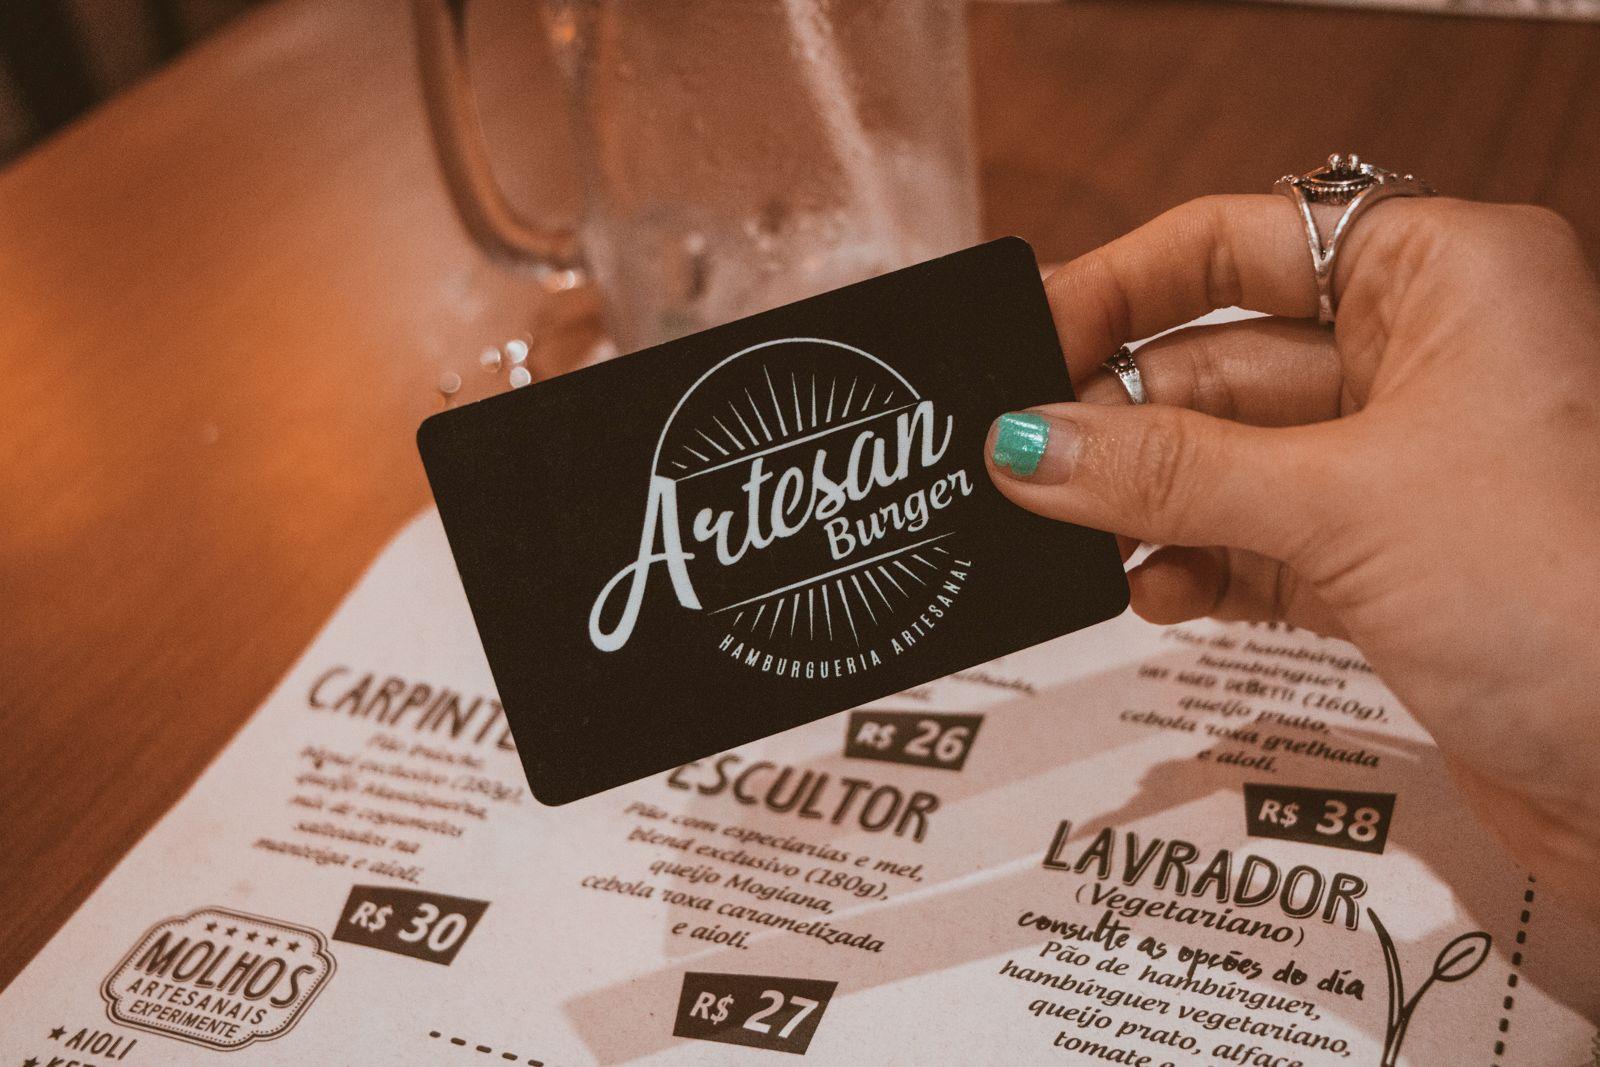 Hamburgueria Artesan Burger | Campinas - SP